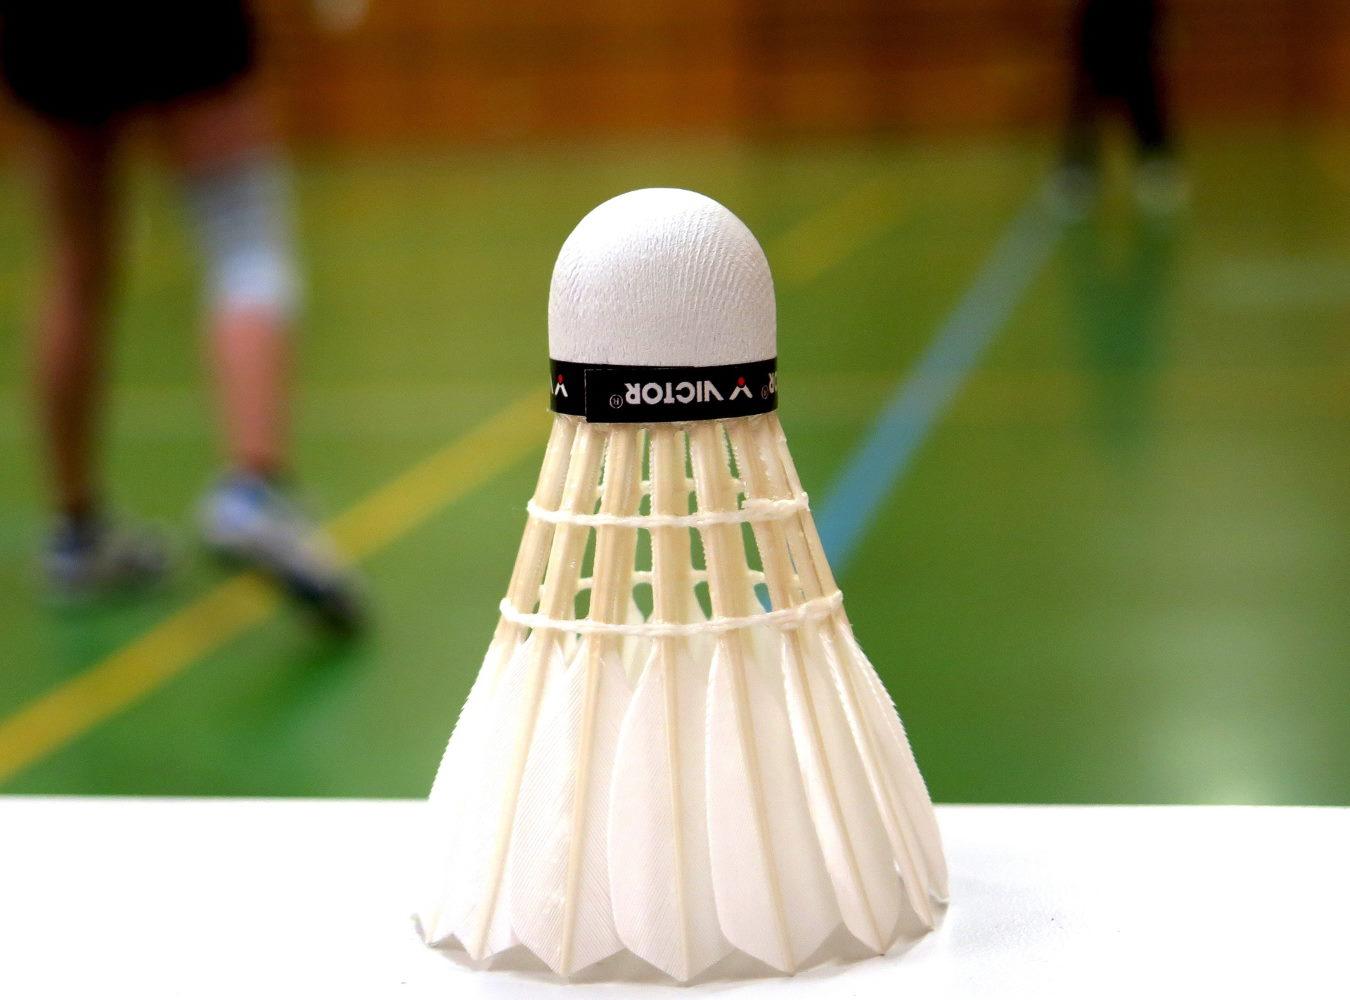 https://www.bcetupes.info/wp-content/uploads/2019/09/badminton_1350.jpg